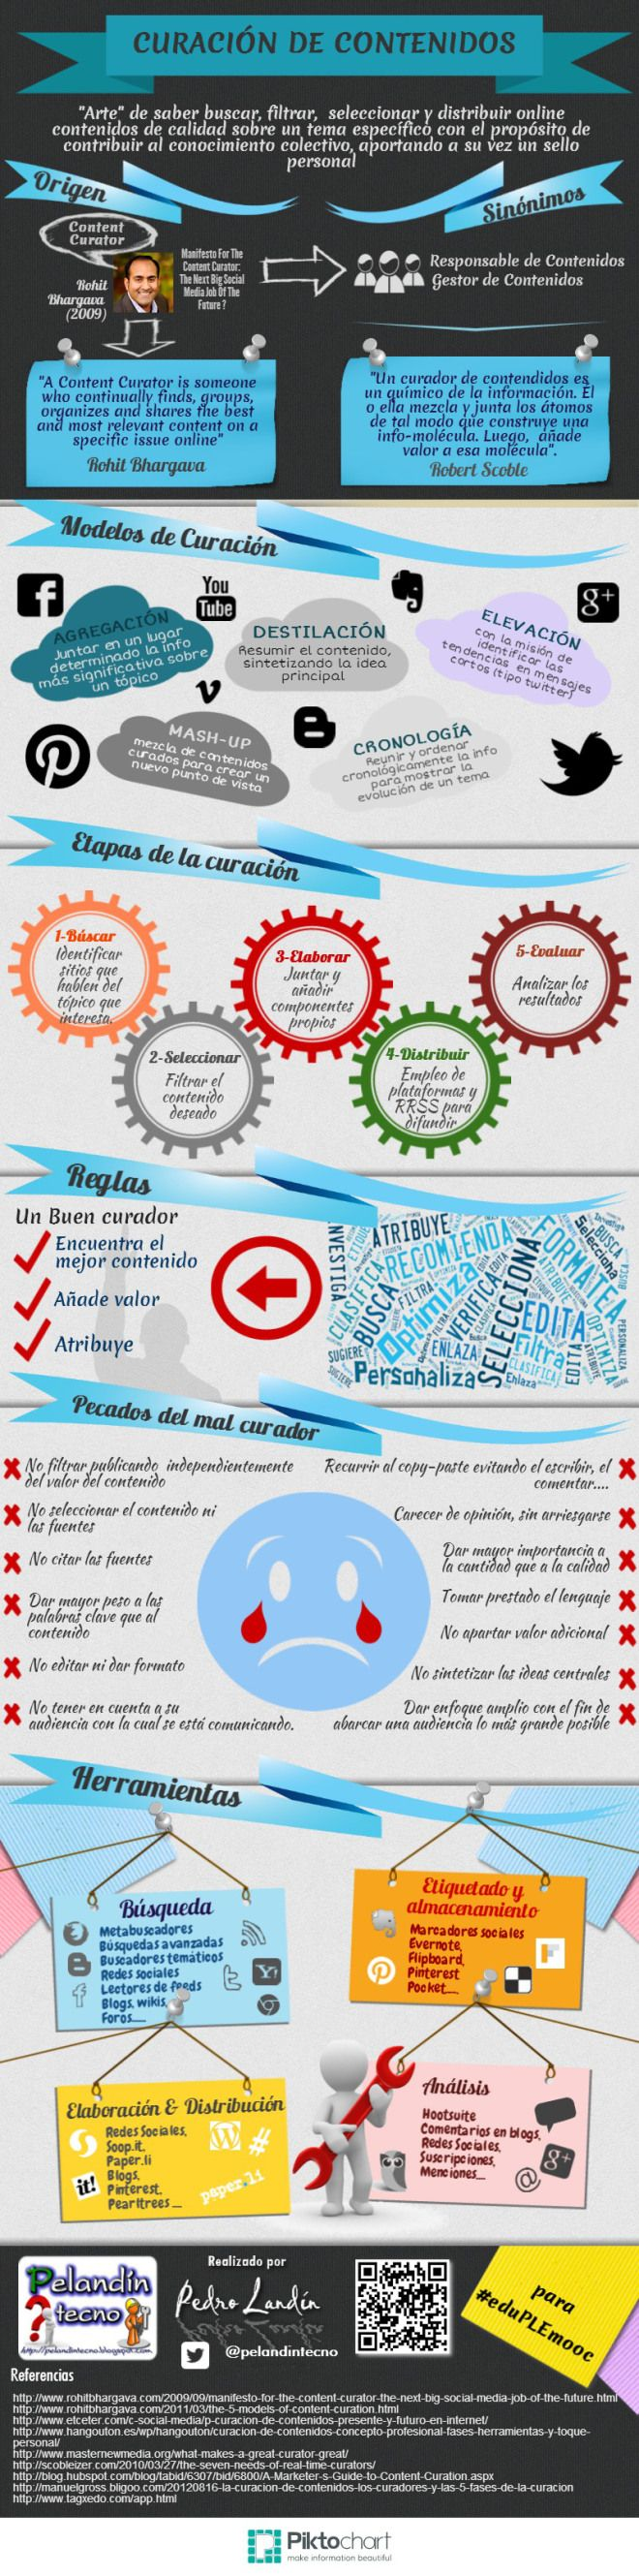 119 best Information & Communication Technology images on Pinterest ...